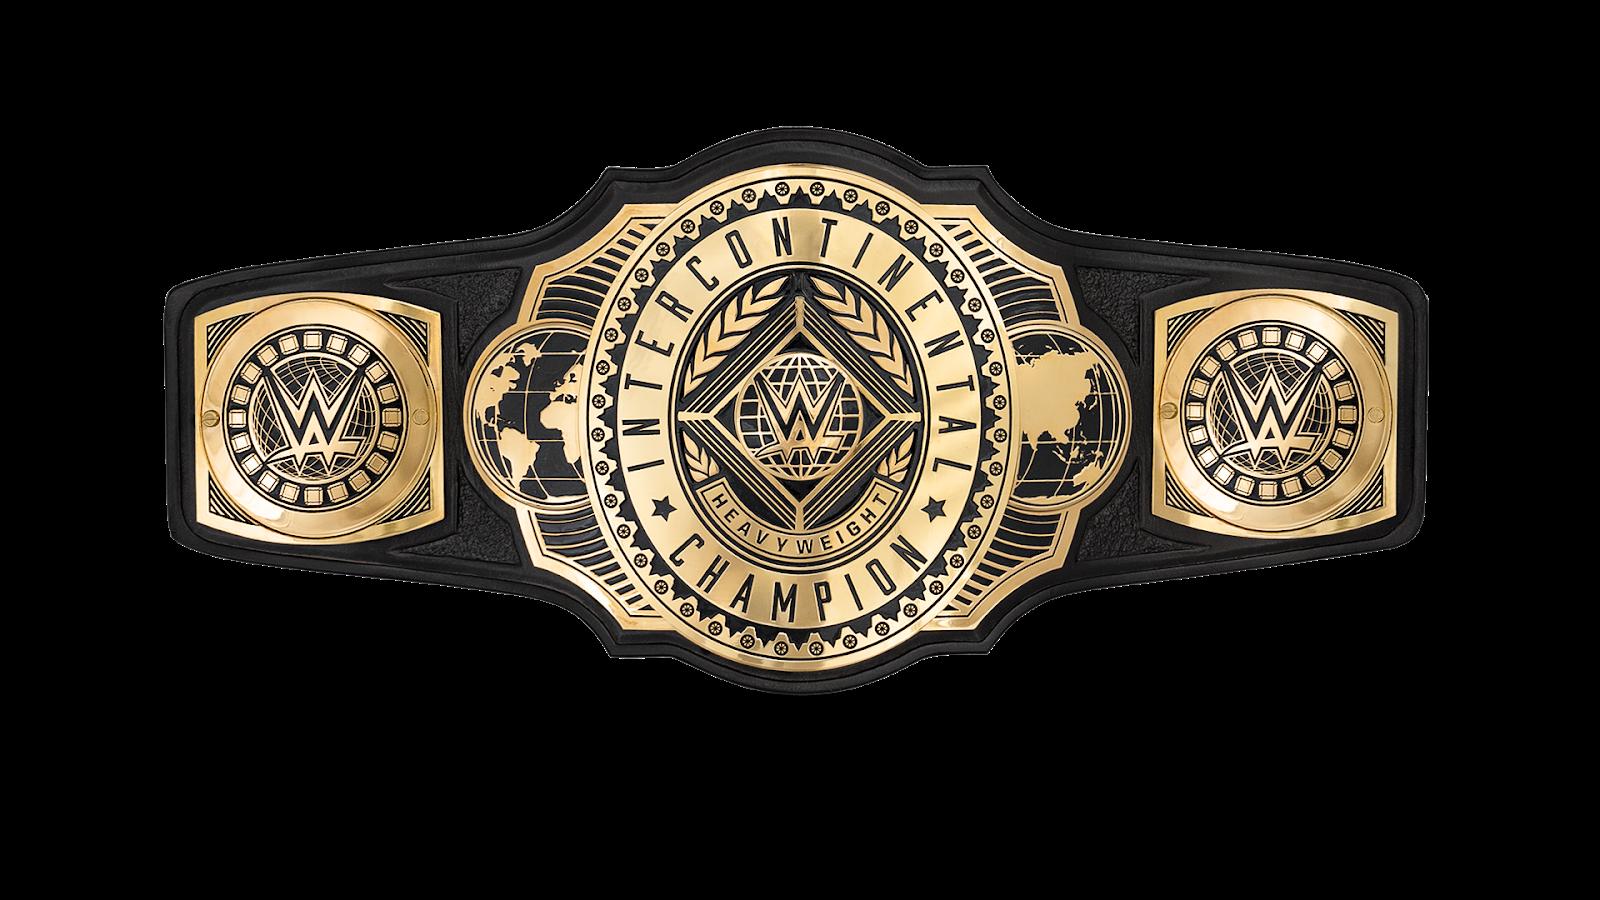 current WWE Intercontinental champion title holder